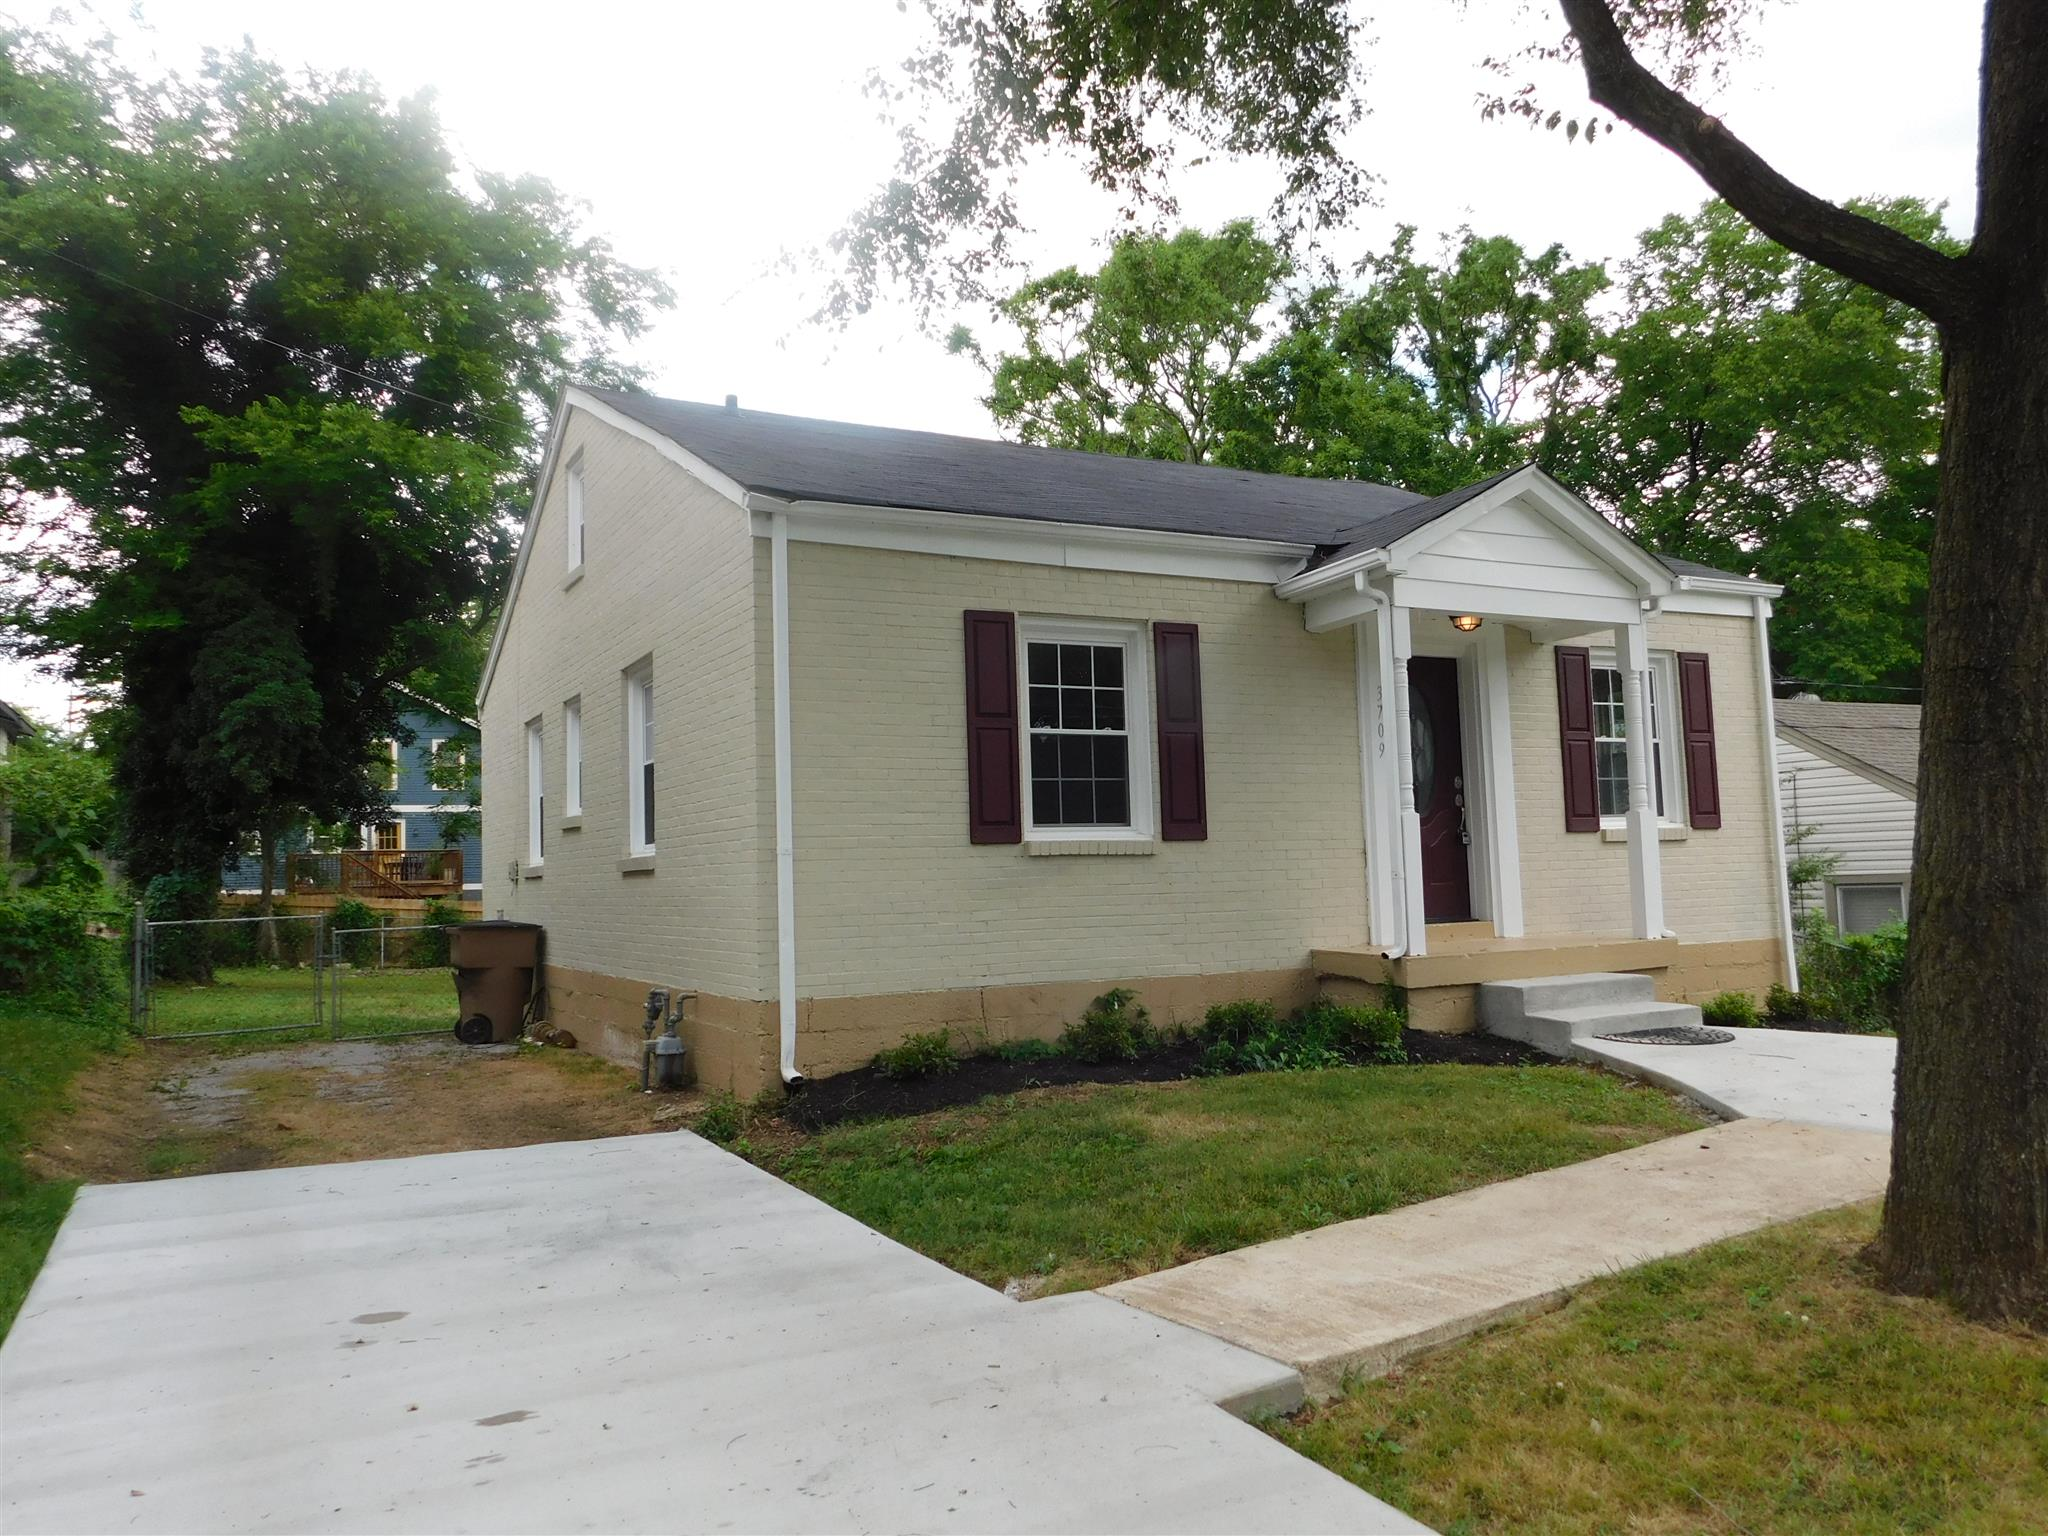 3709 Burrus St, Nashville, TN 37216 - Nashville, TN real estate listing